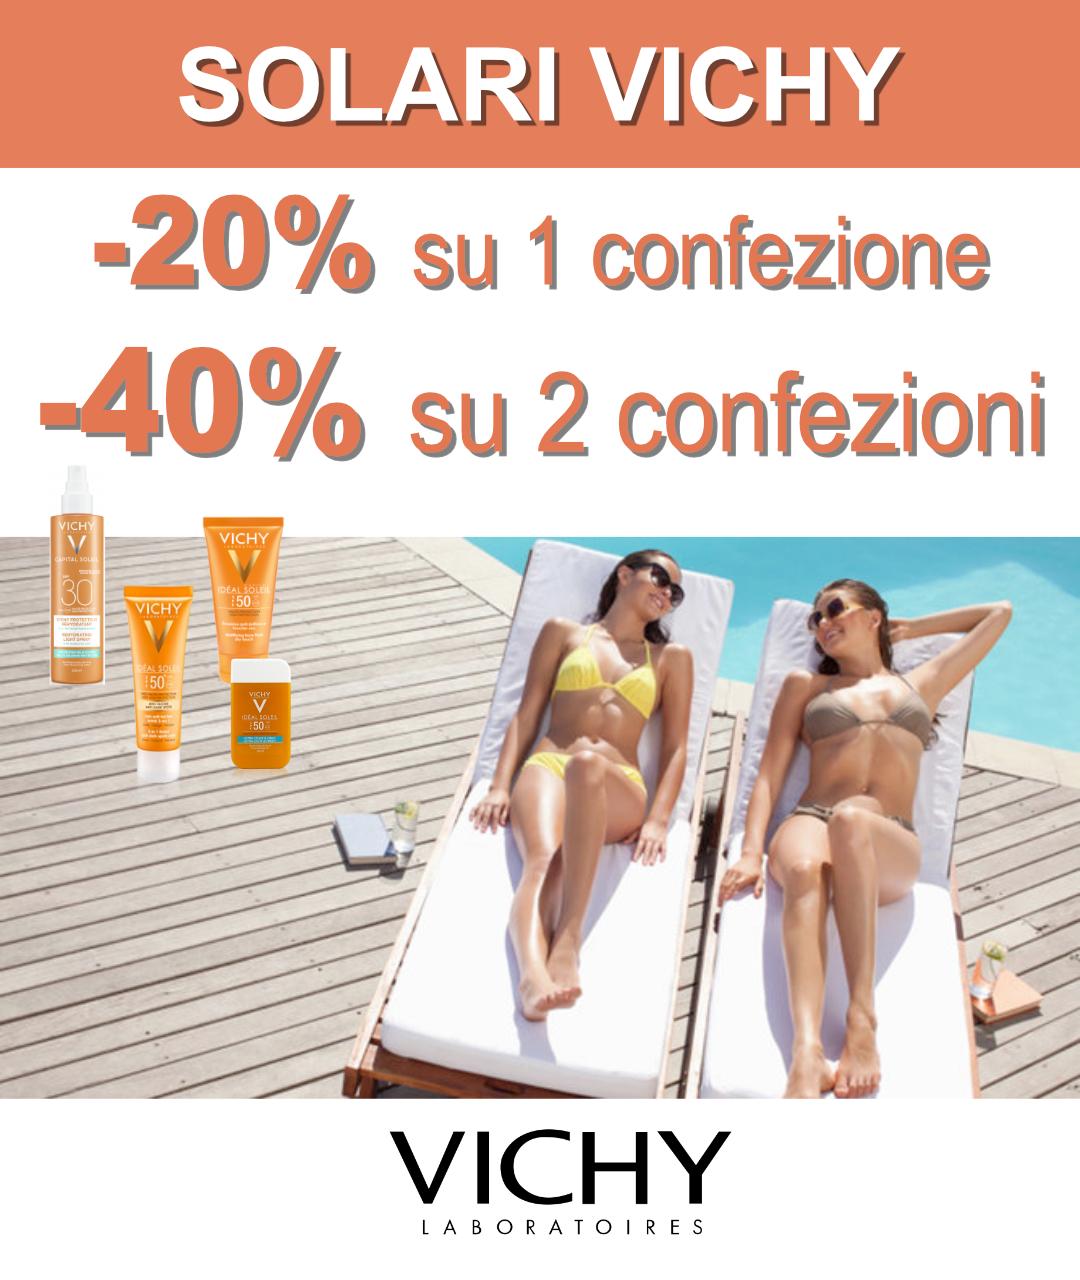 Vichy-solari-06-21